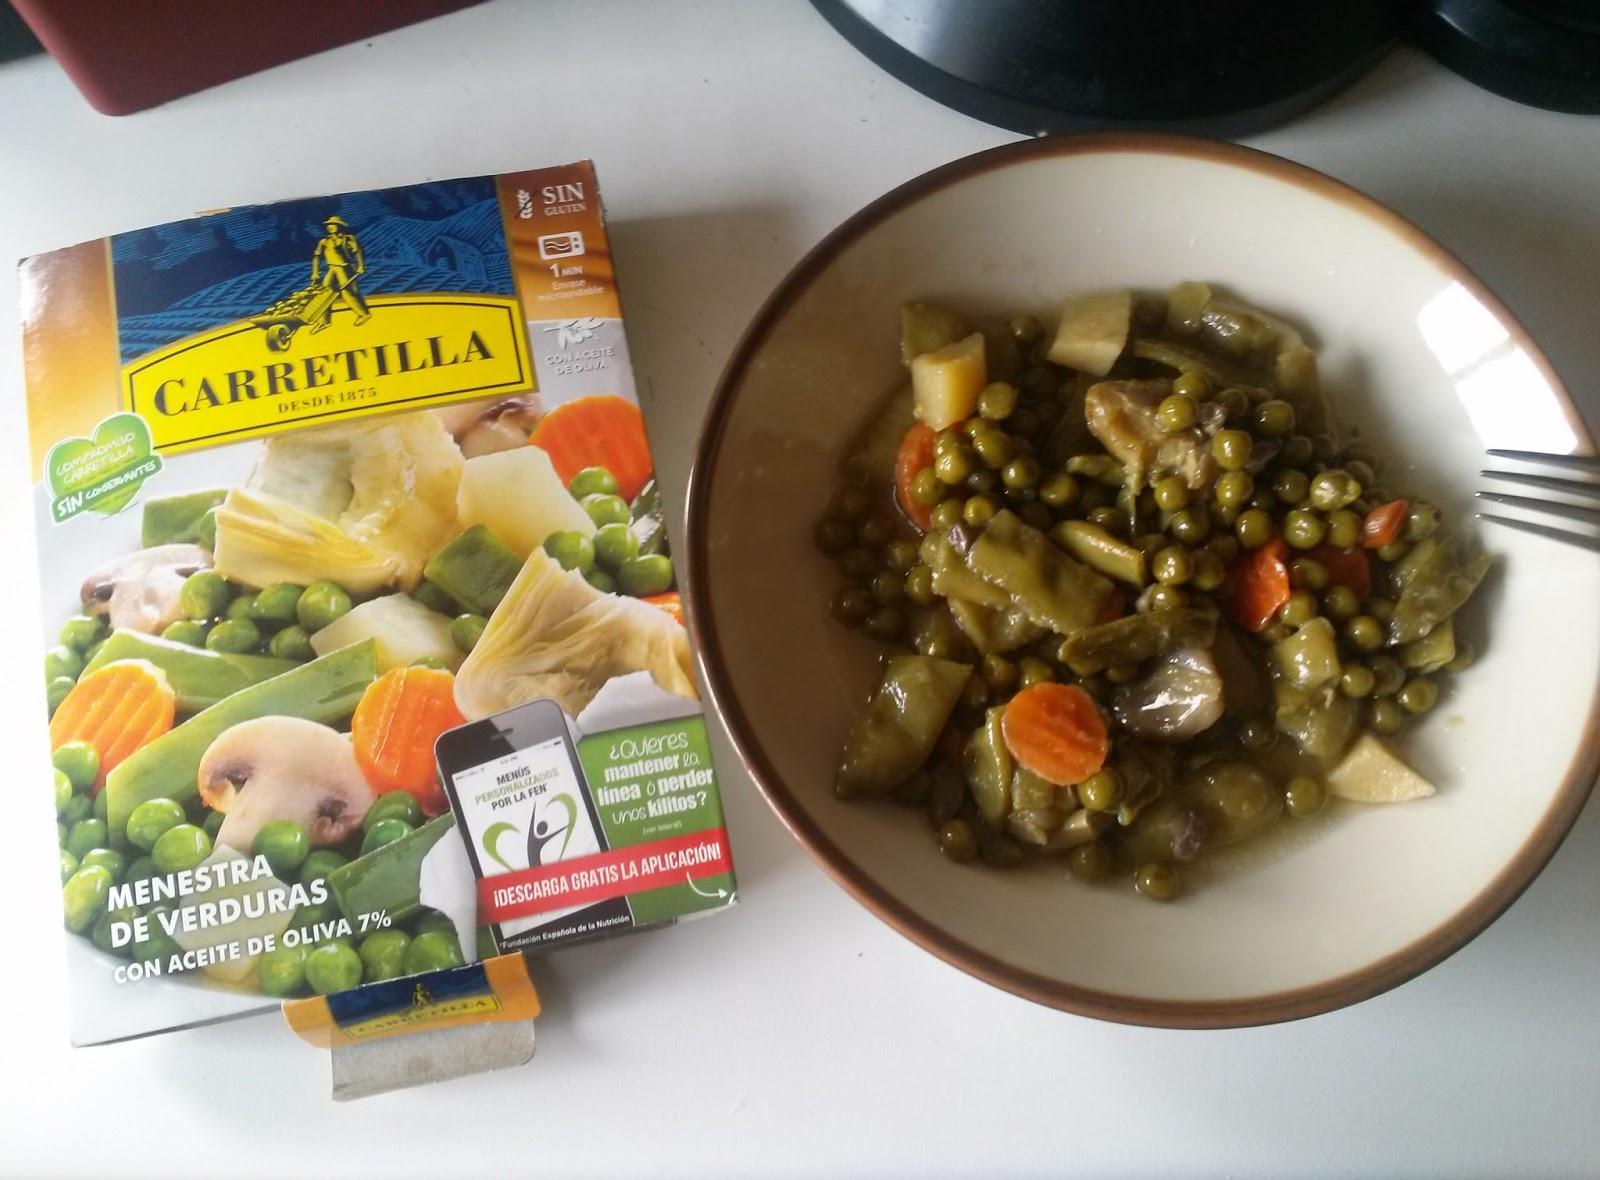 Bonito cocinar menestra de verduras fotos esta receta de - Menestra de verduras en texturas ...